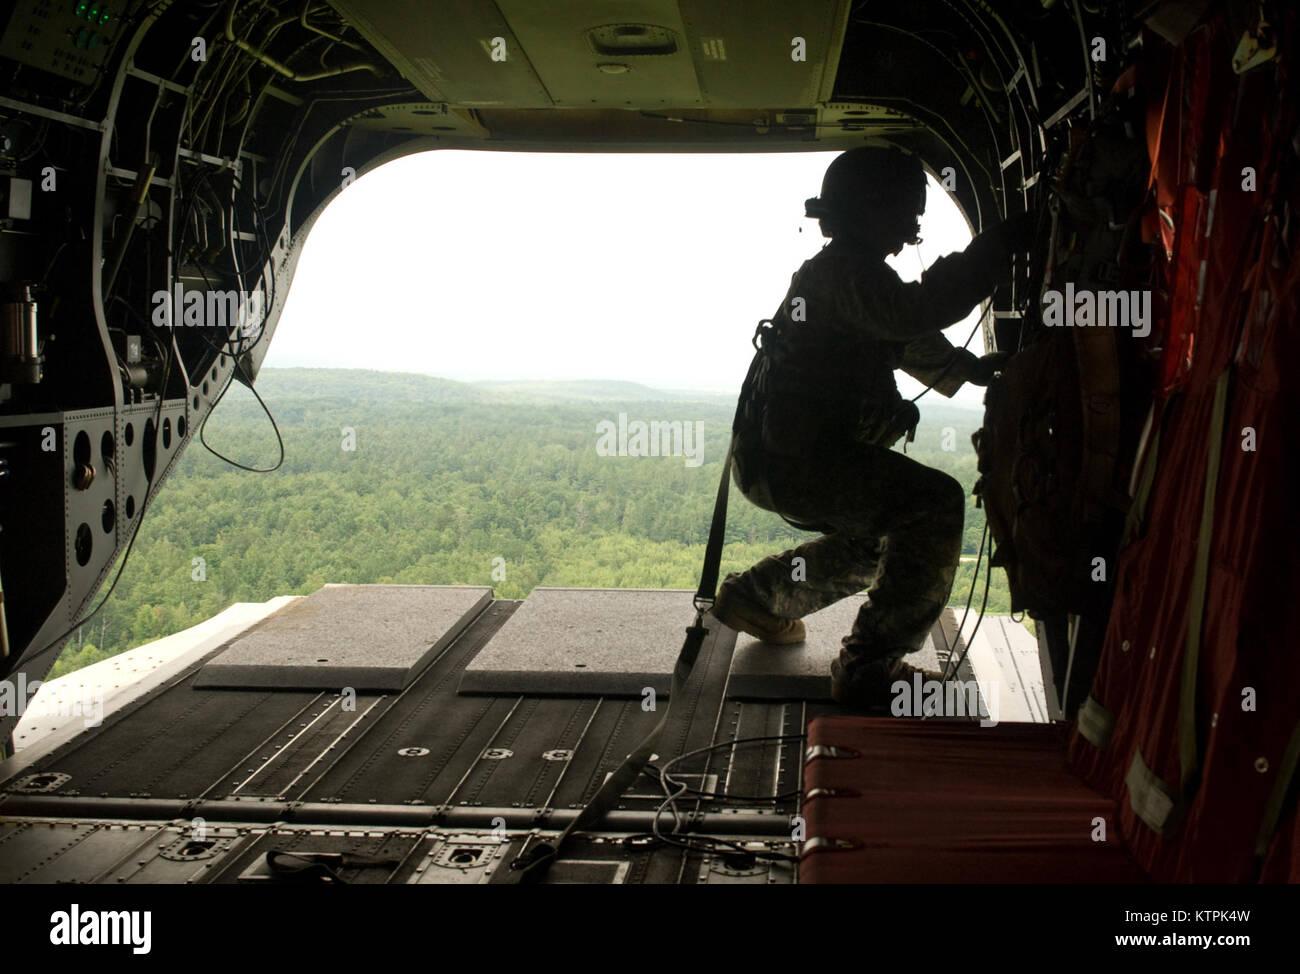 27th Engineer Battalion Stock Photos & 27th Engineer